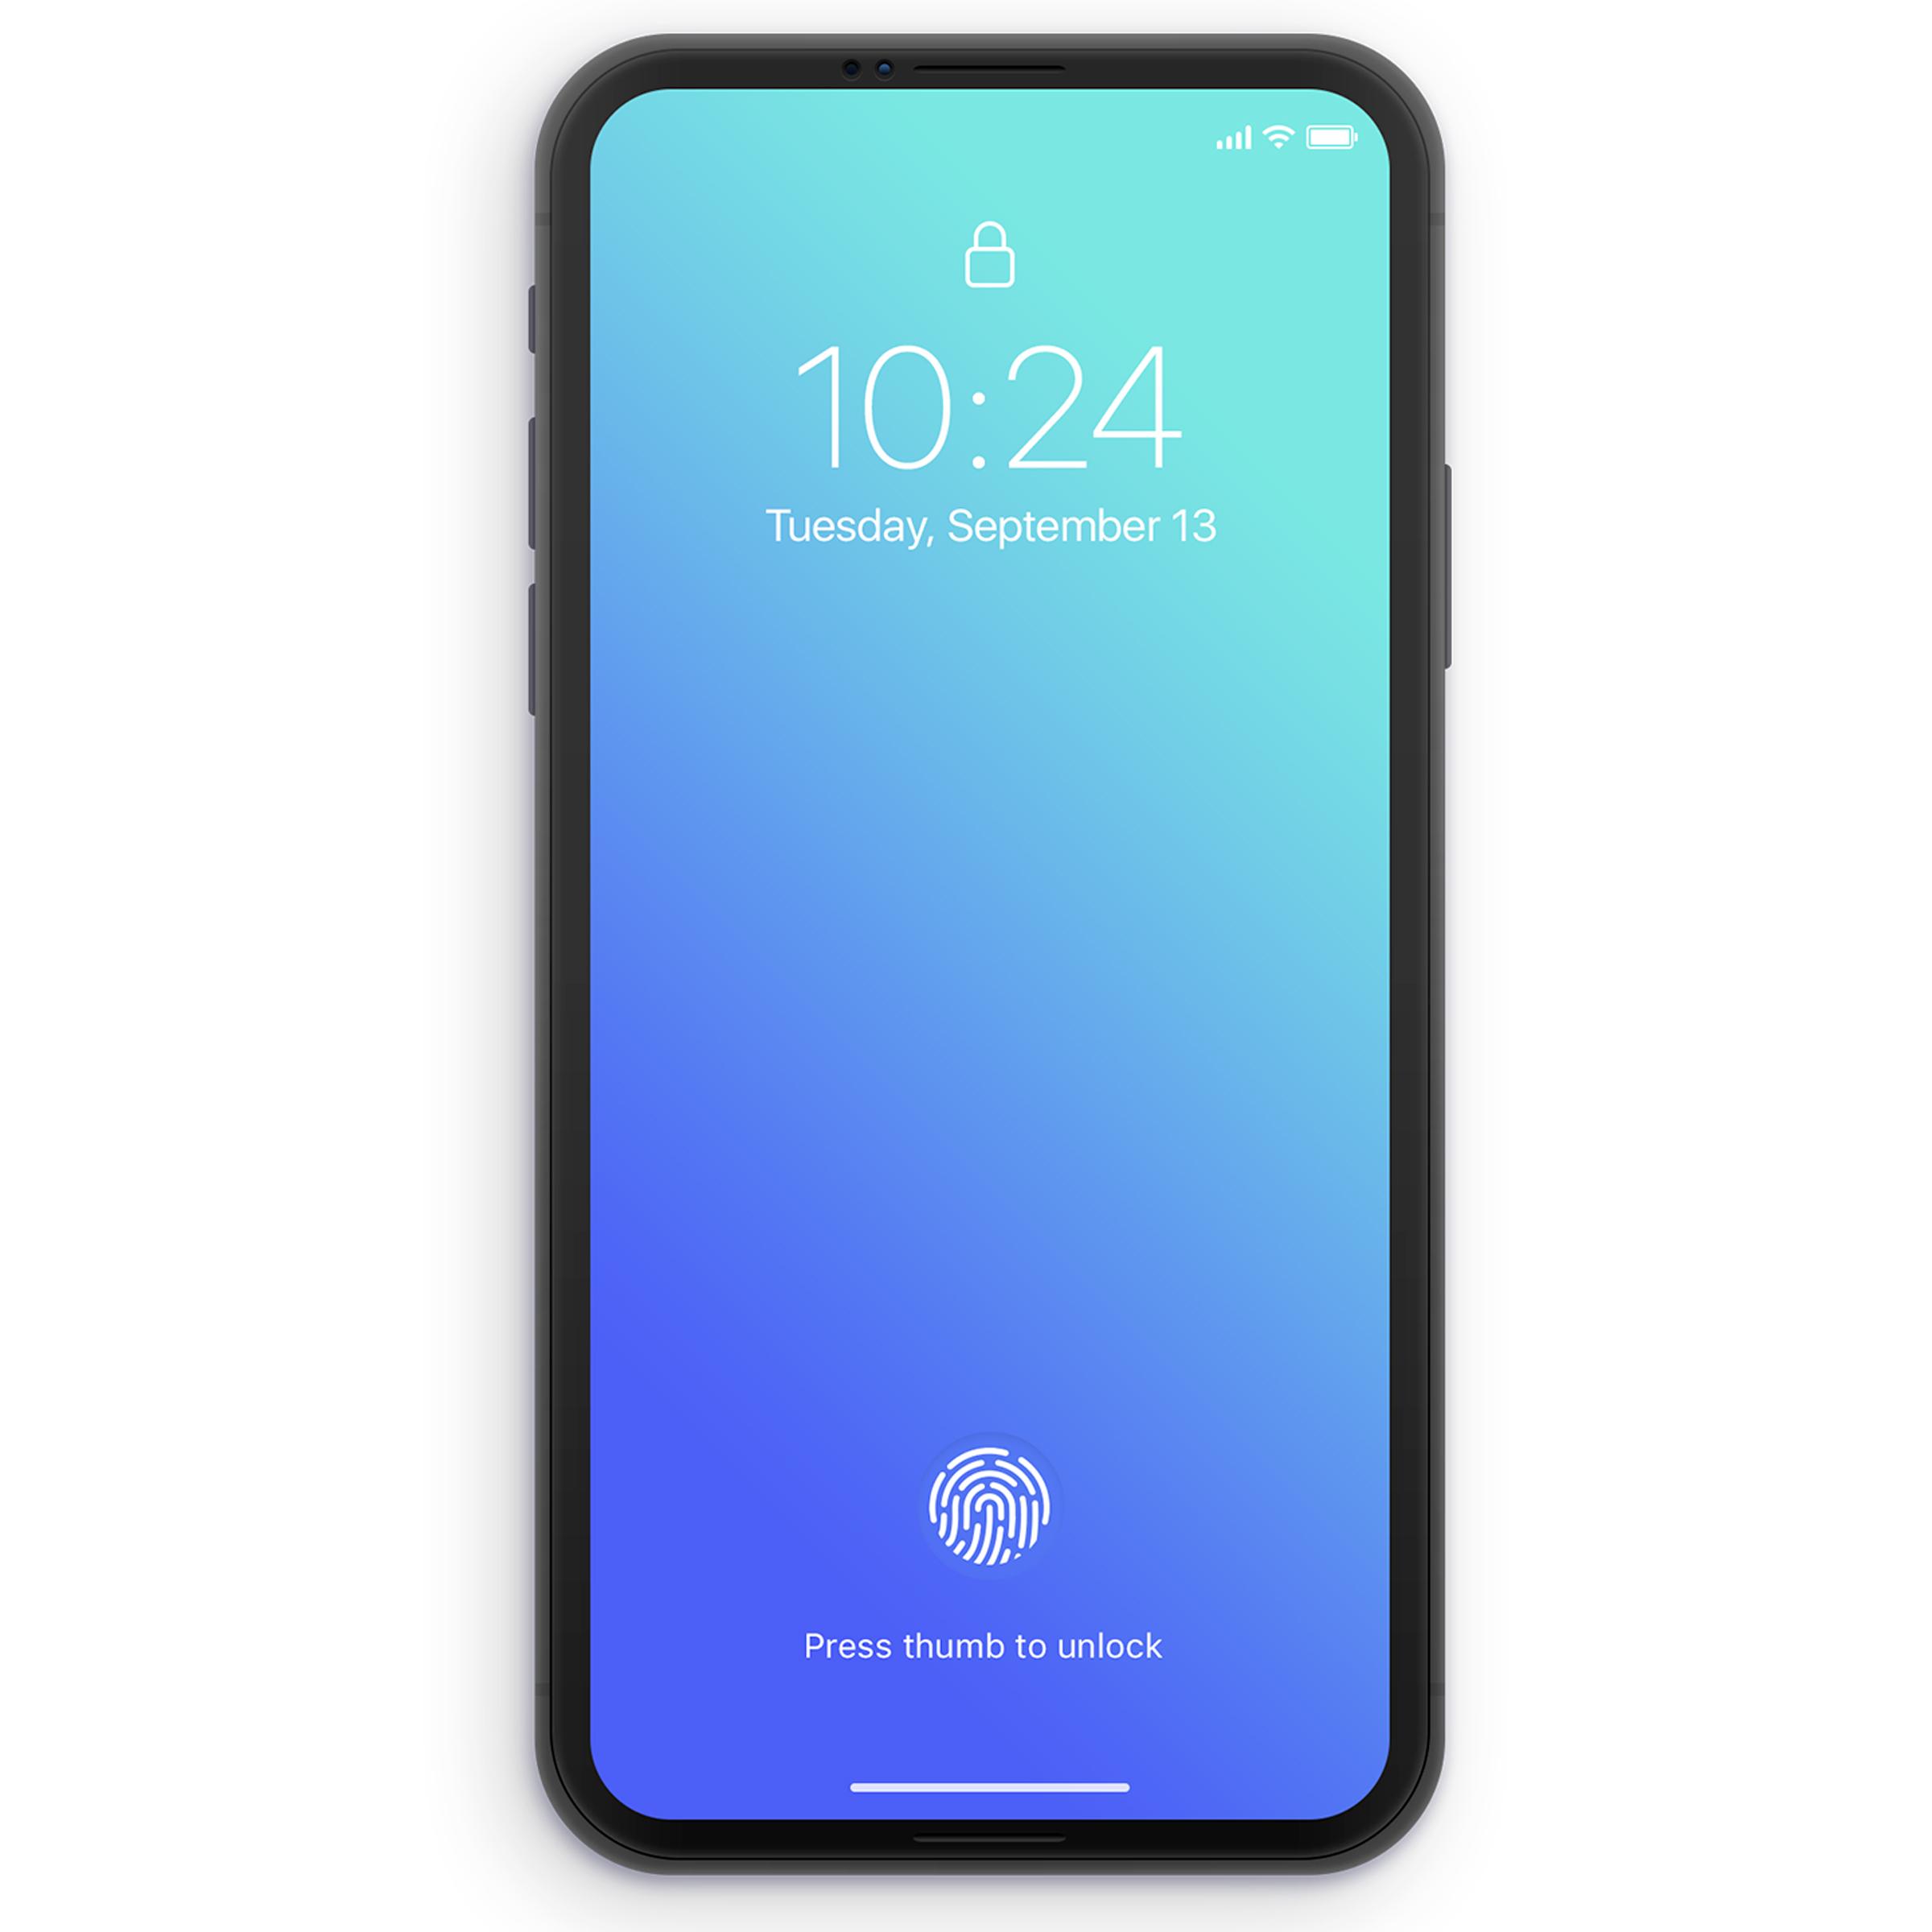 Kaseyrandall iphone concept future ui mobile fingerprint embedded dribbble2